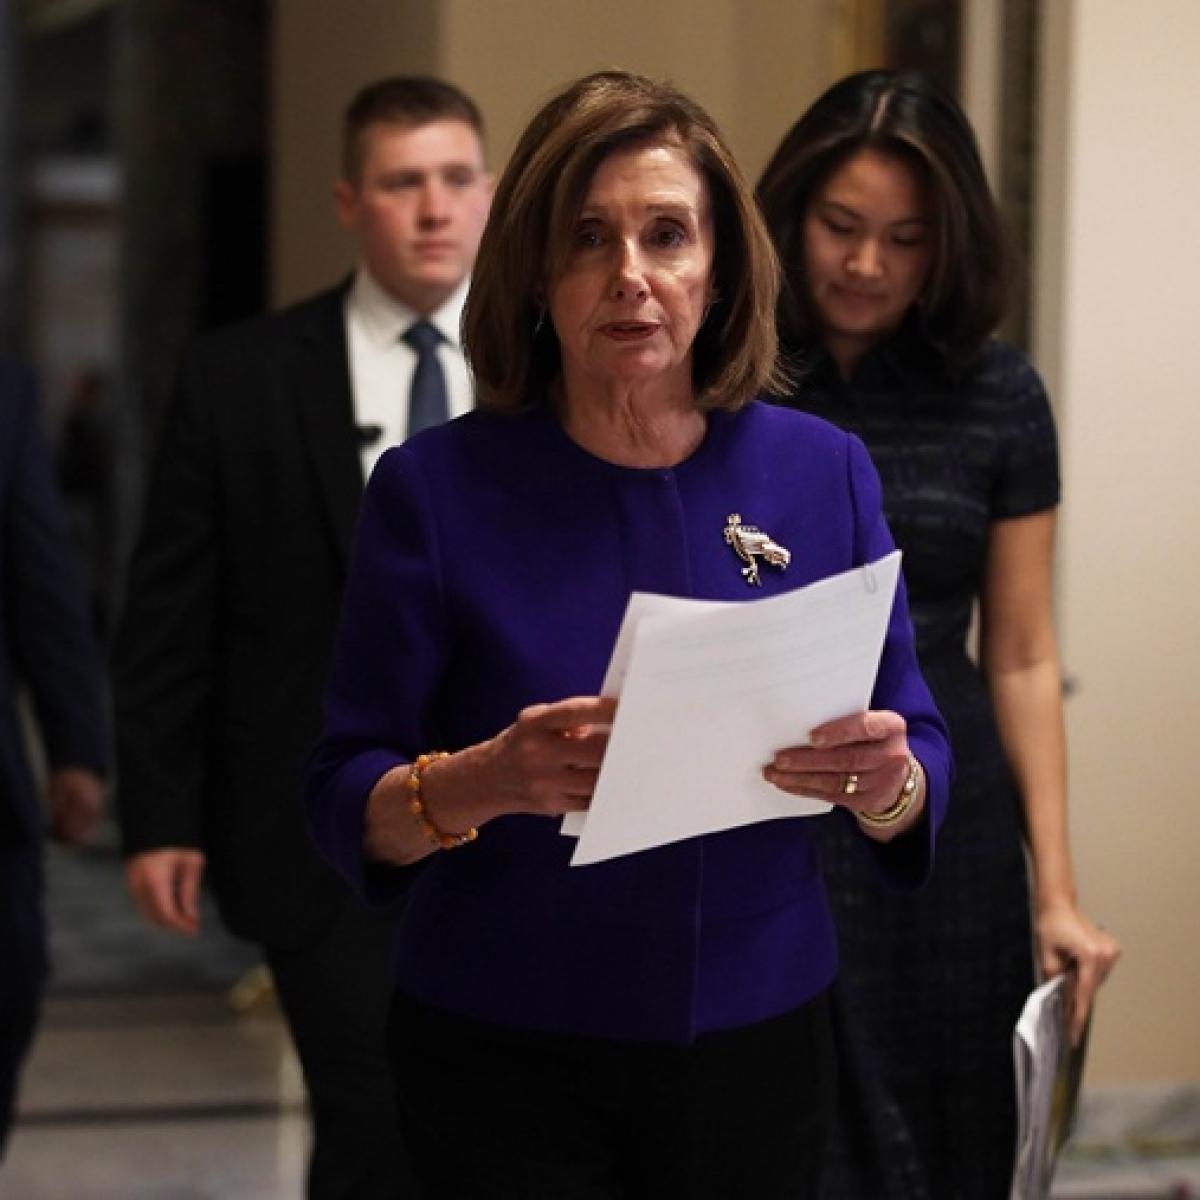 Will soon send articles of impeachment against Trump to Senate: Nancy Pelosi